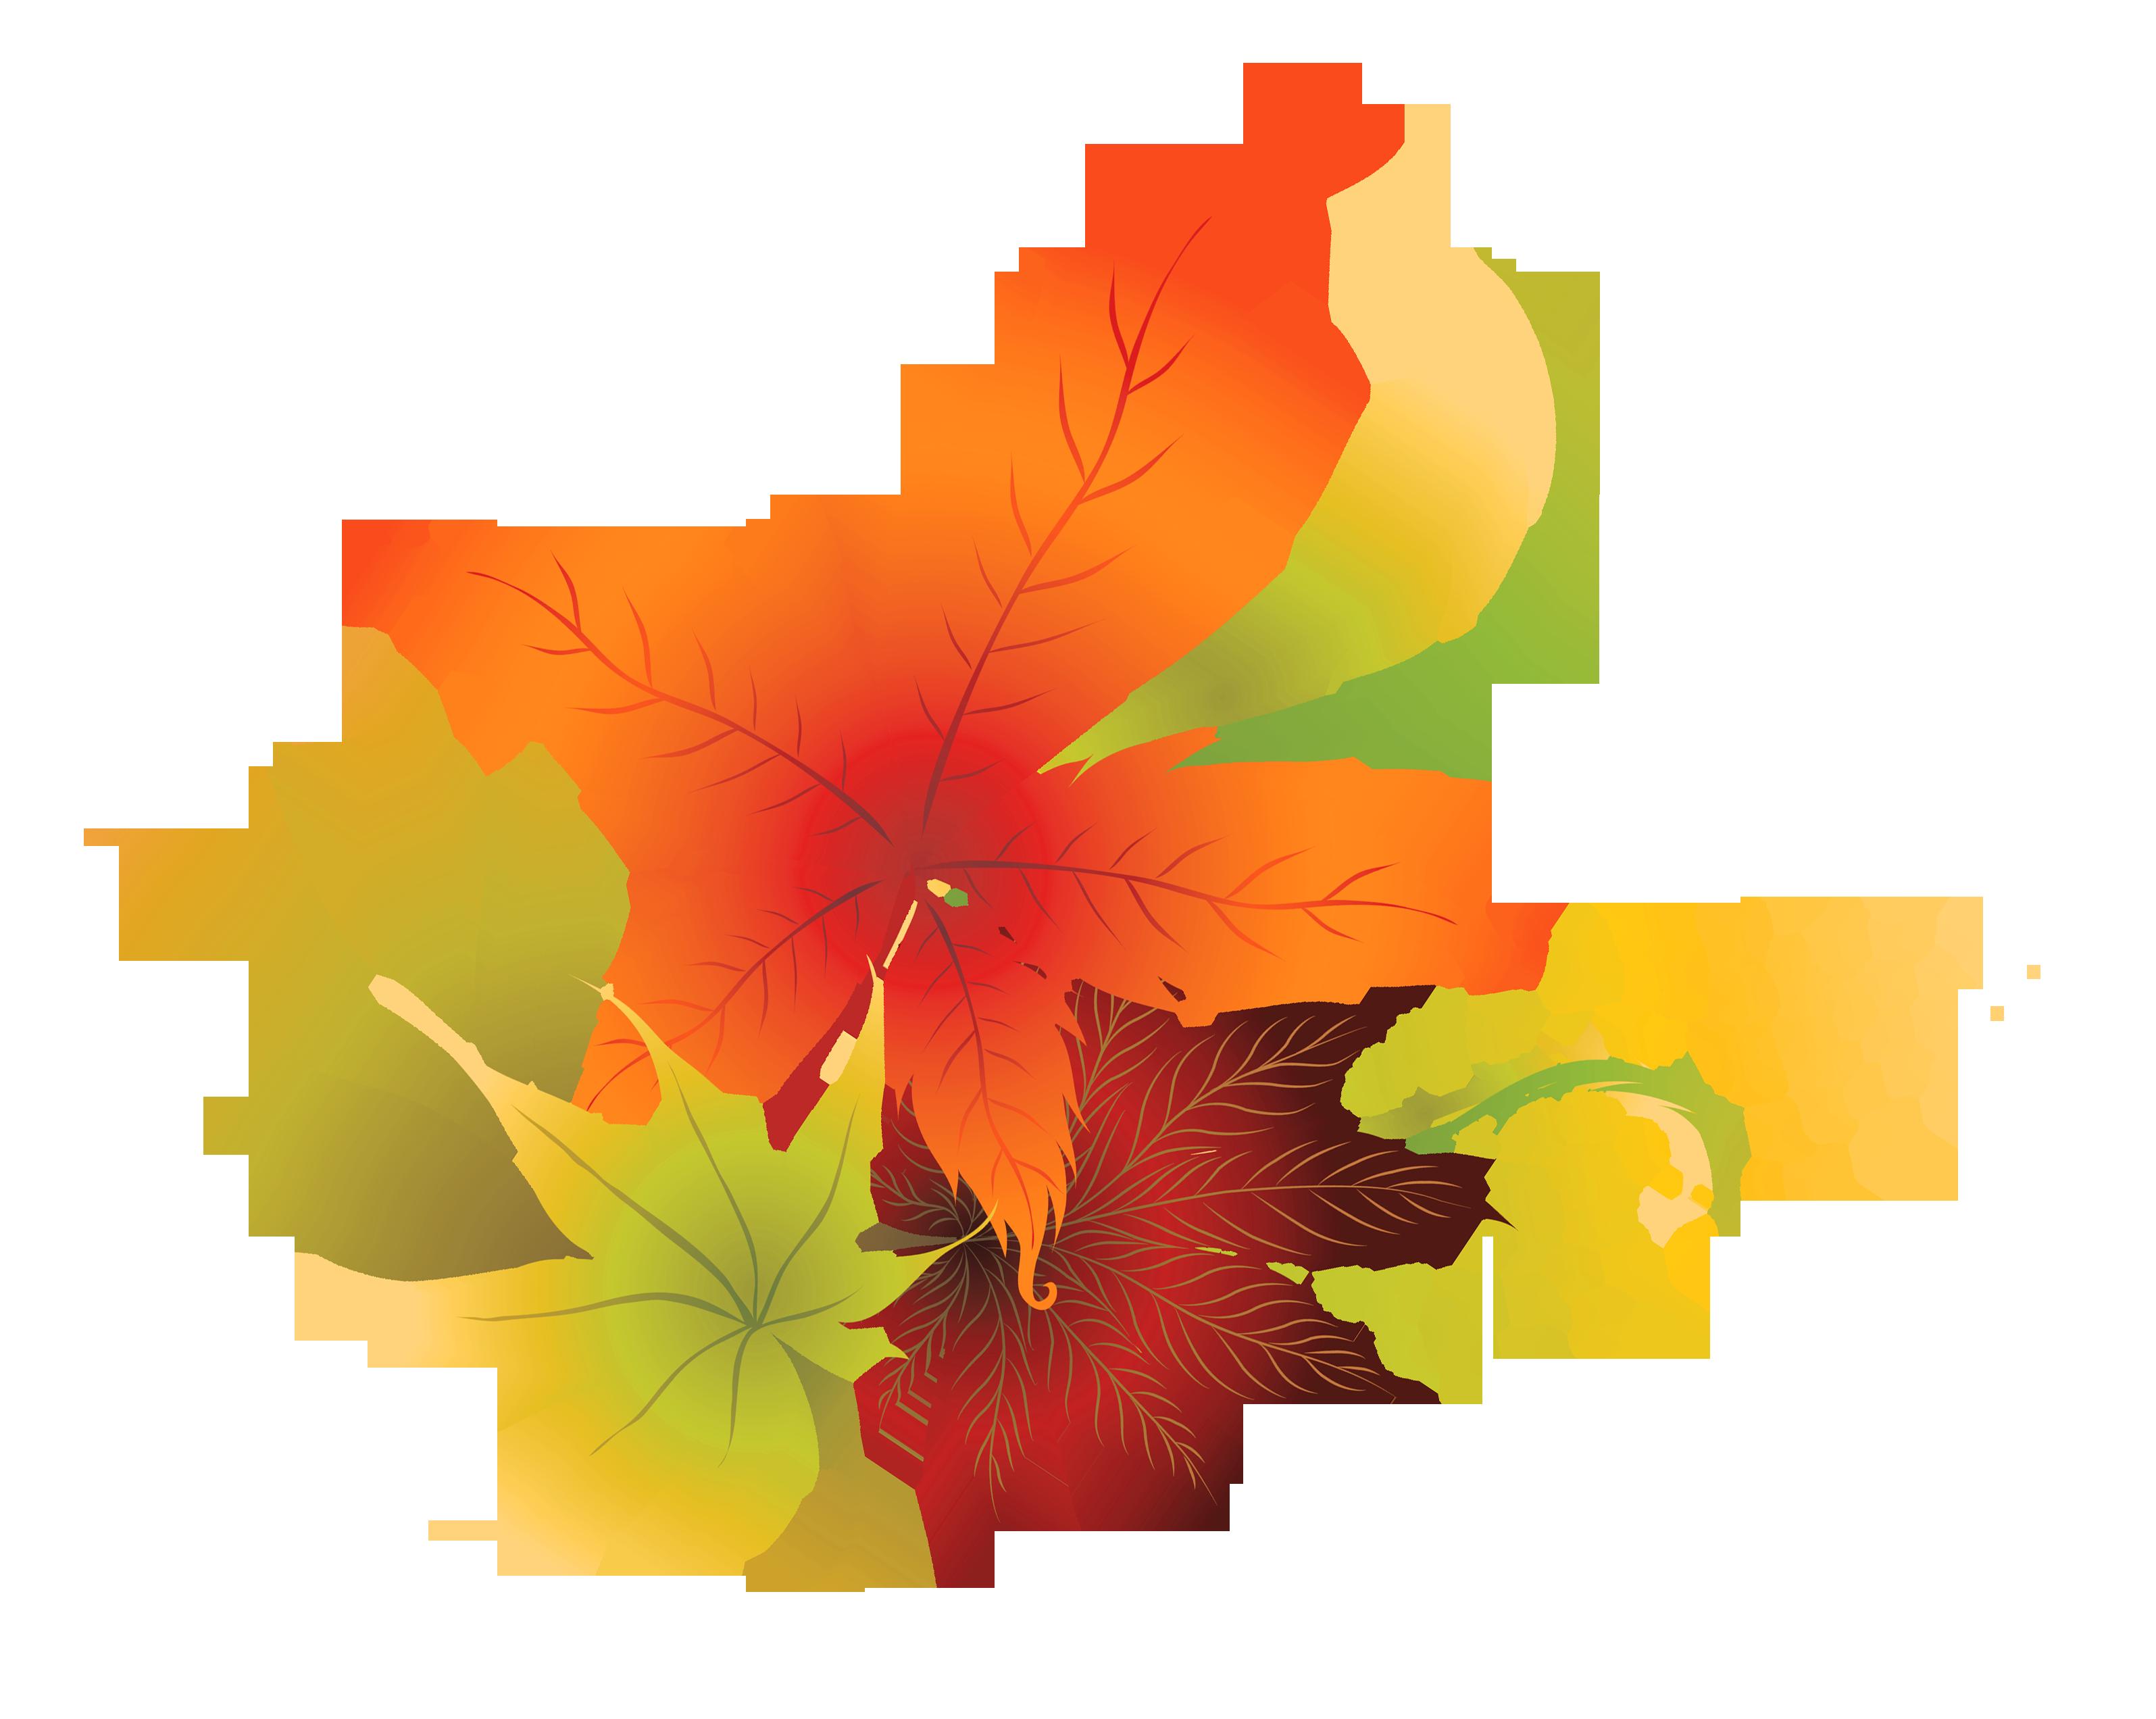 Fall Leaves 7 Free Autumn And Fall Clip -Fall leaves 7 free autumn and fall clip art collections 2 clipartcow-12